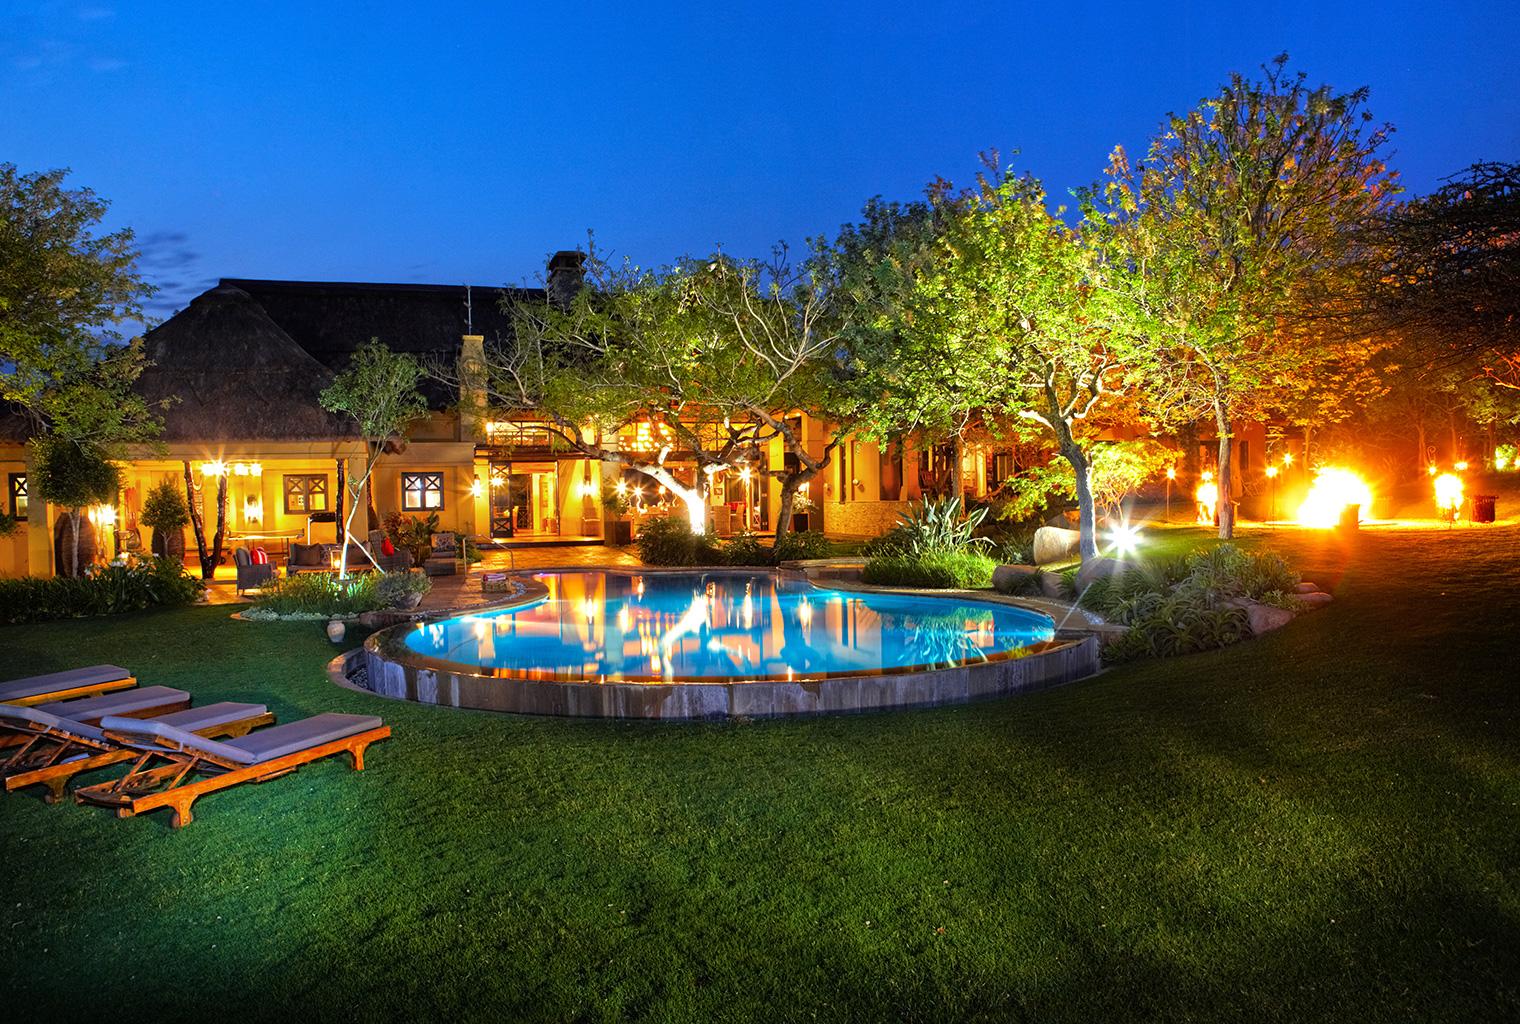 Thanda-Villa-Izulu-South-Africa-Exterior-Night